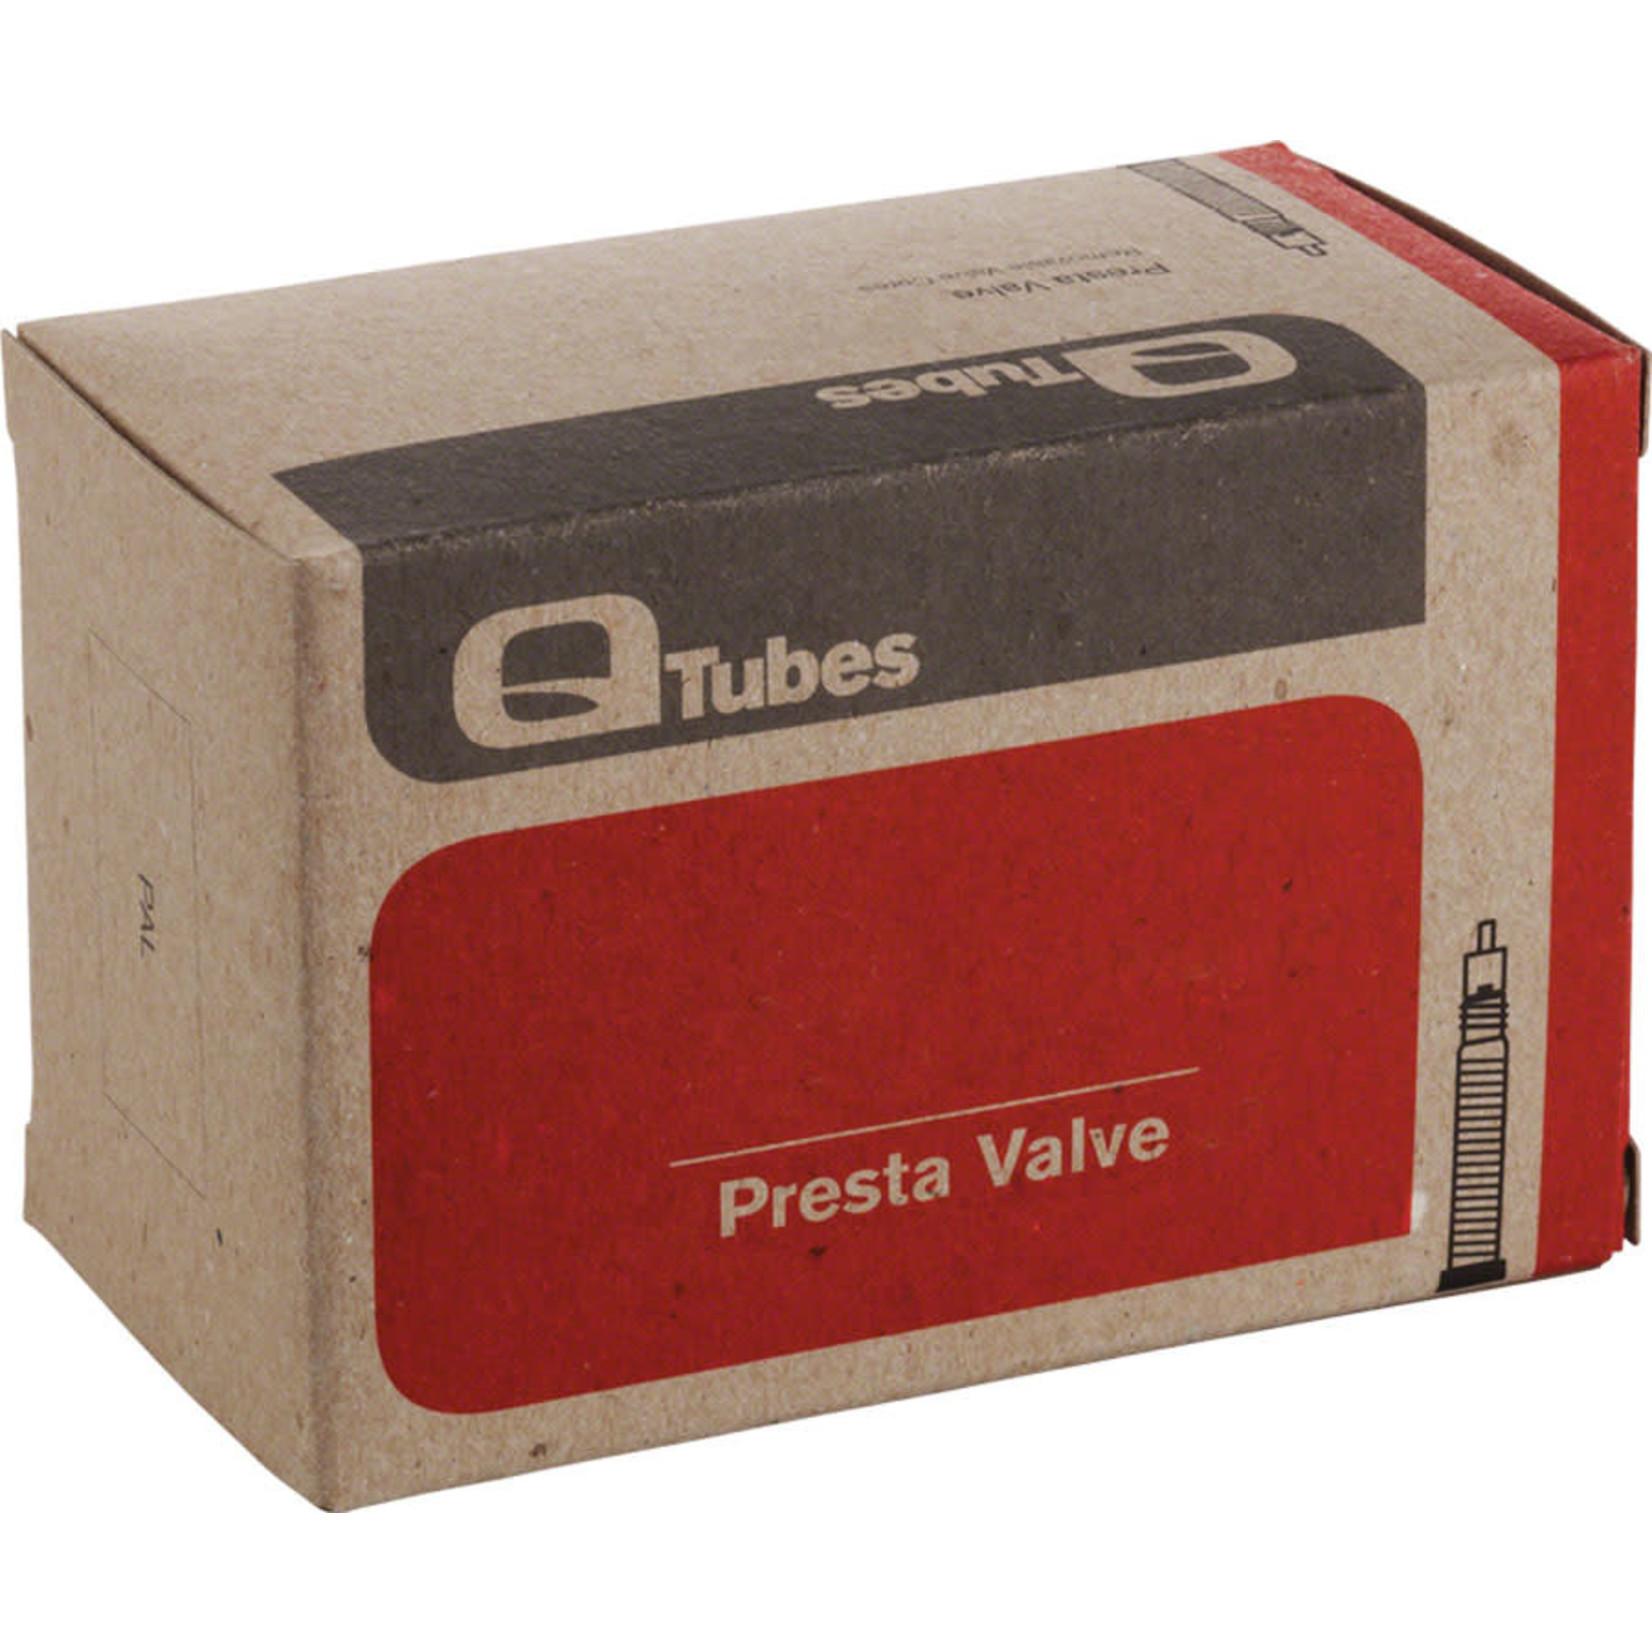 Q-Tubes Q-Tubes 700x20-28C 48mm Presta Valve Tube 126g